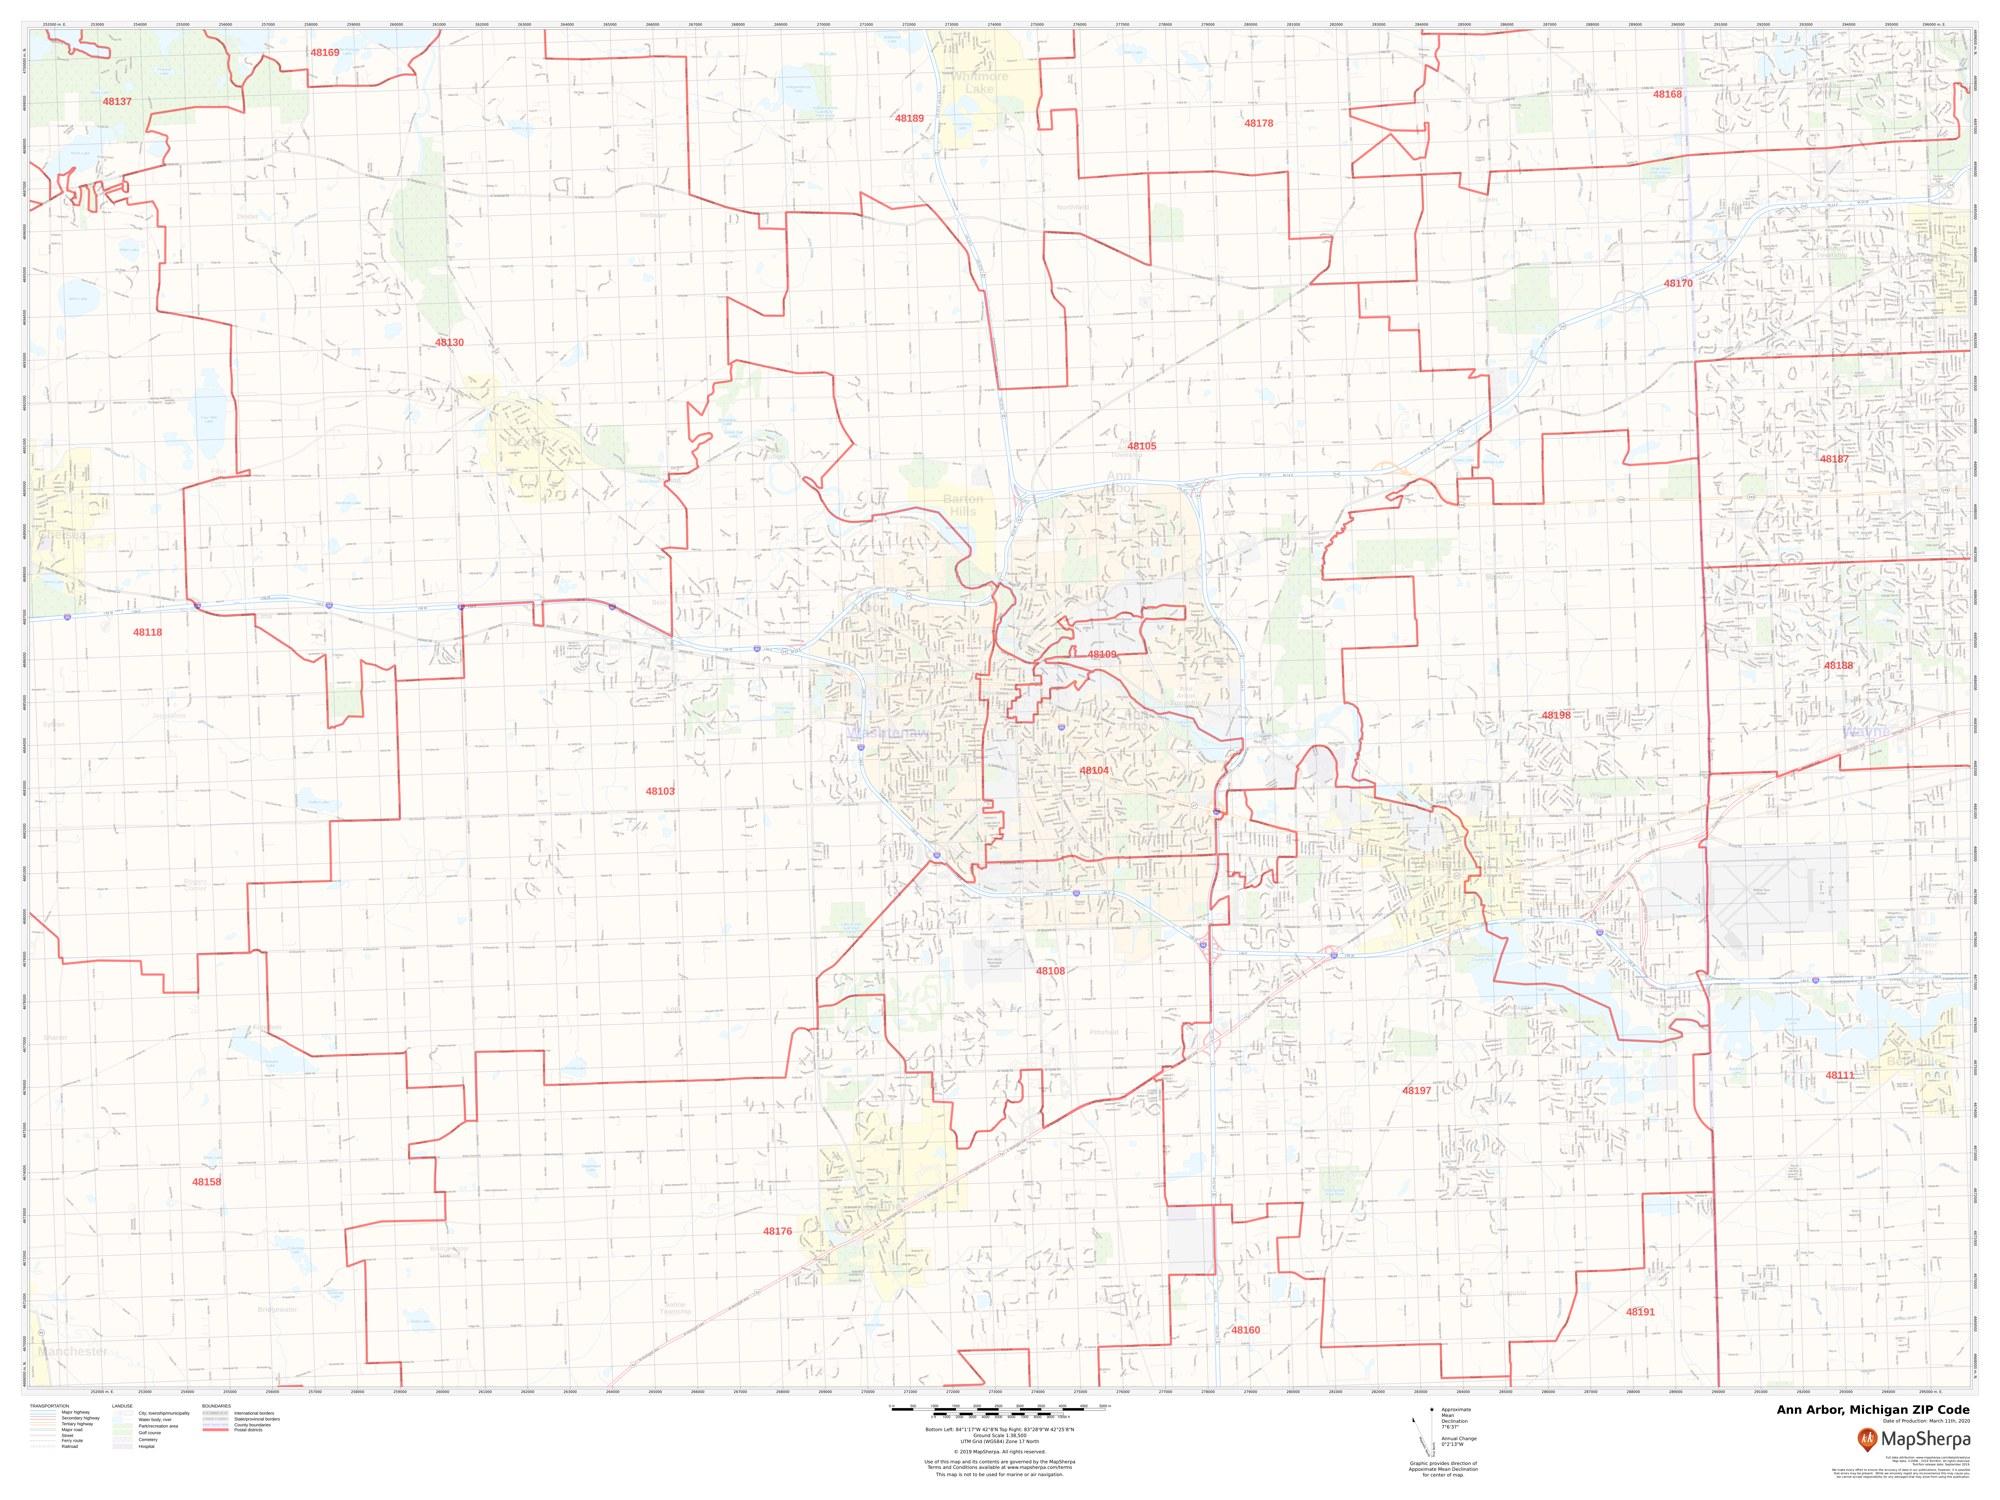 Ann Arbor ZIP Code Map, Michigan